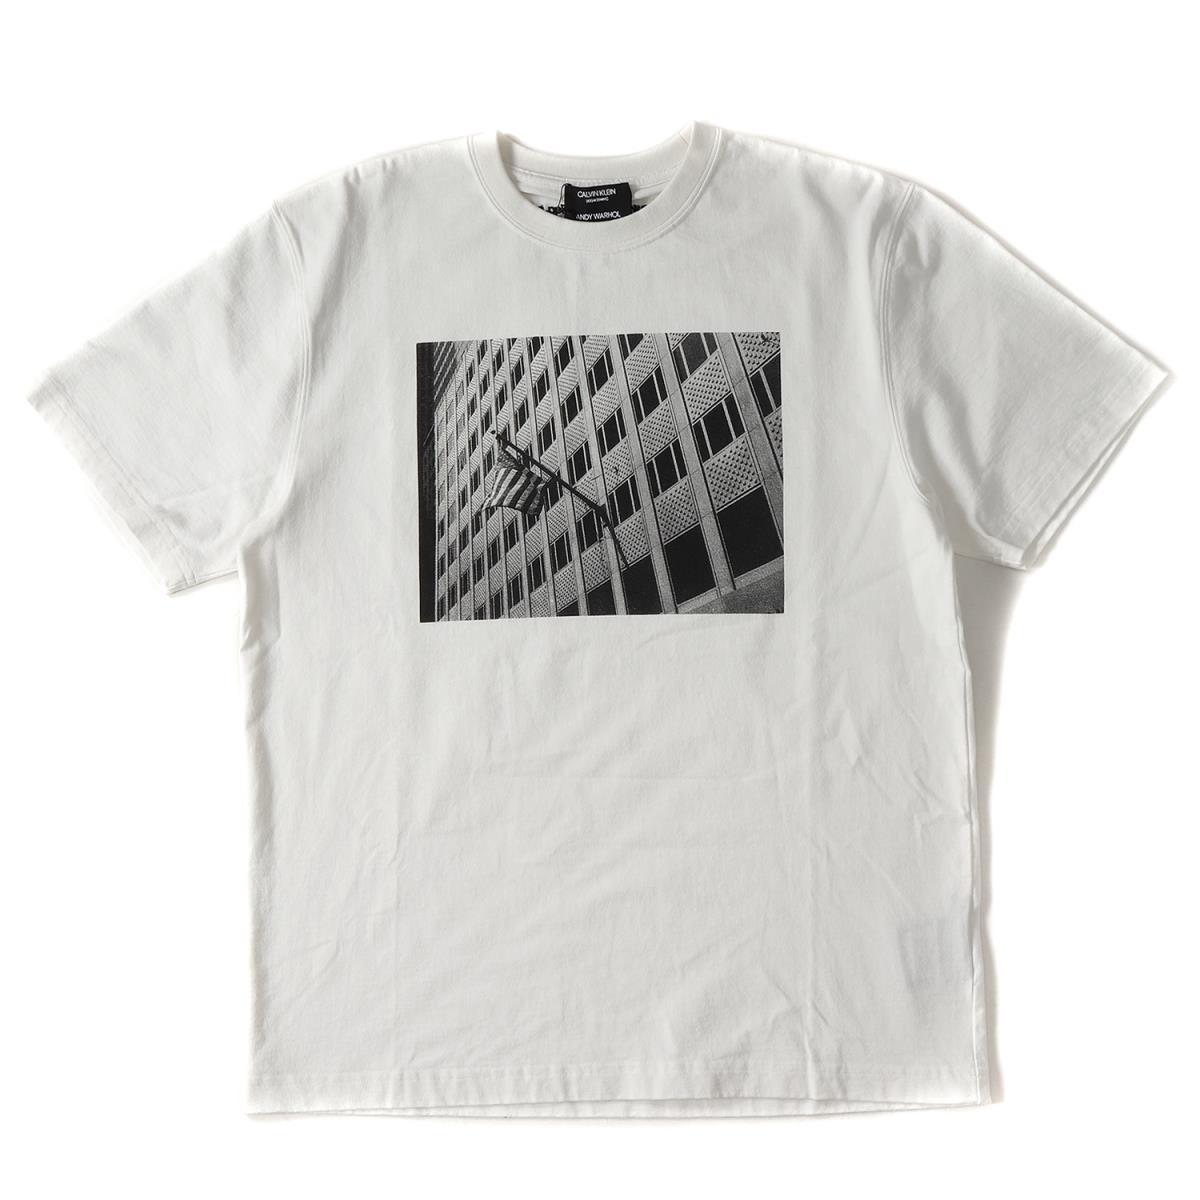 Calvin Klein (カルバンクライン) ×Andy Warhol 星条旗プリントコットンクルーネックTシャツ ホワイト M 【メンズ】【美品】【K2086】【中古】【あす楽☆対応可】